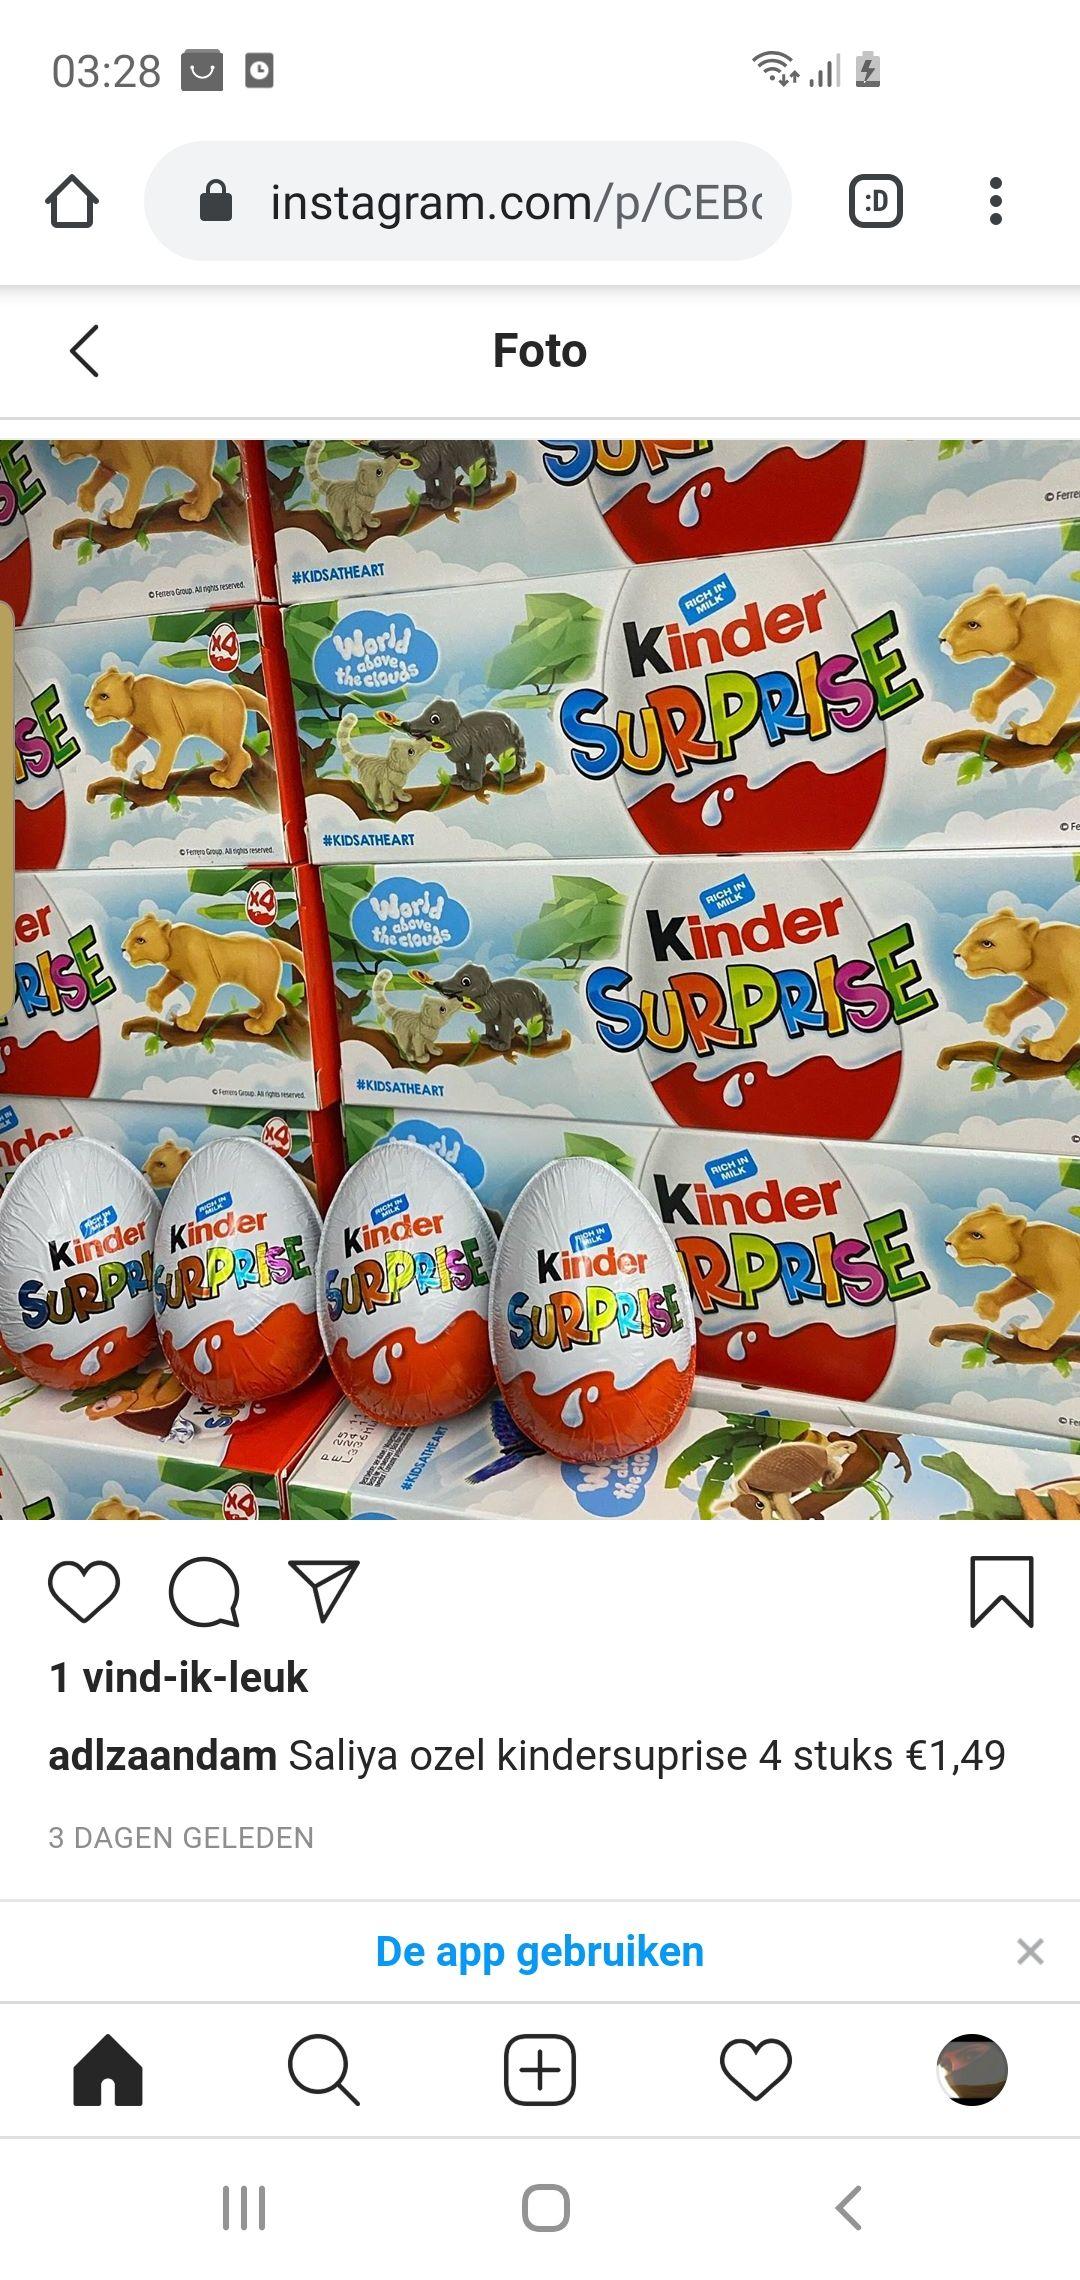 Lokaal ADL supermarkt zaandam/ kinder eieren/ferrero rocher chocolade